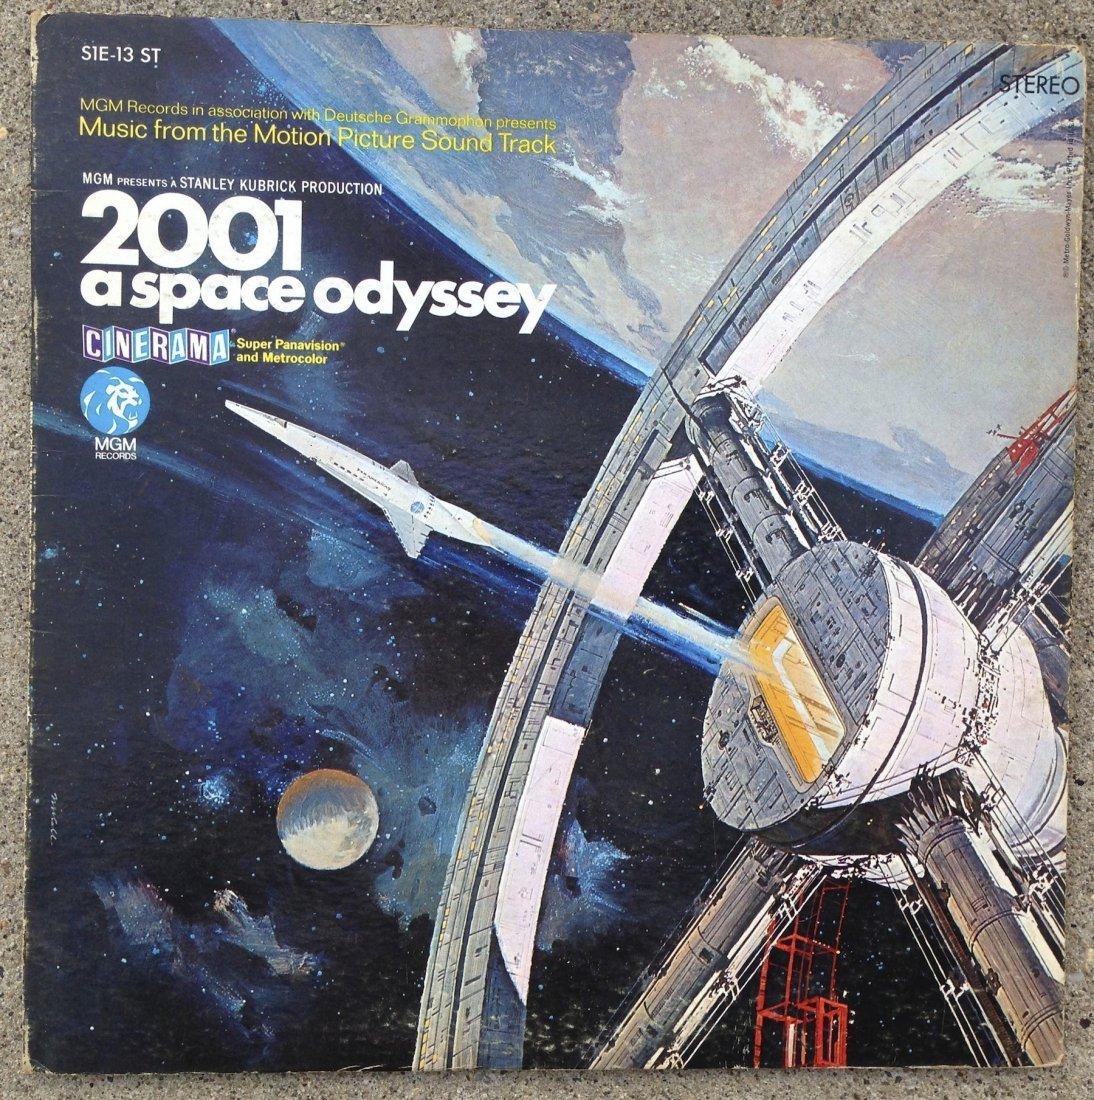 2001 a space odyssey soundtrack album